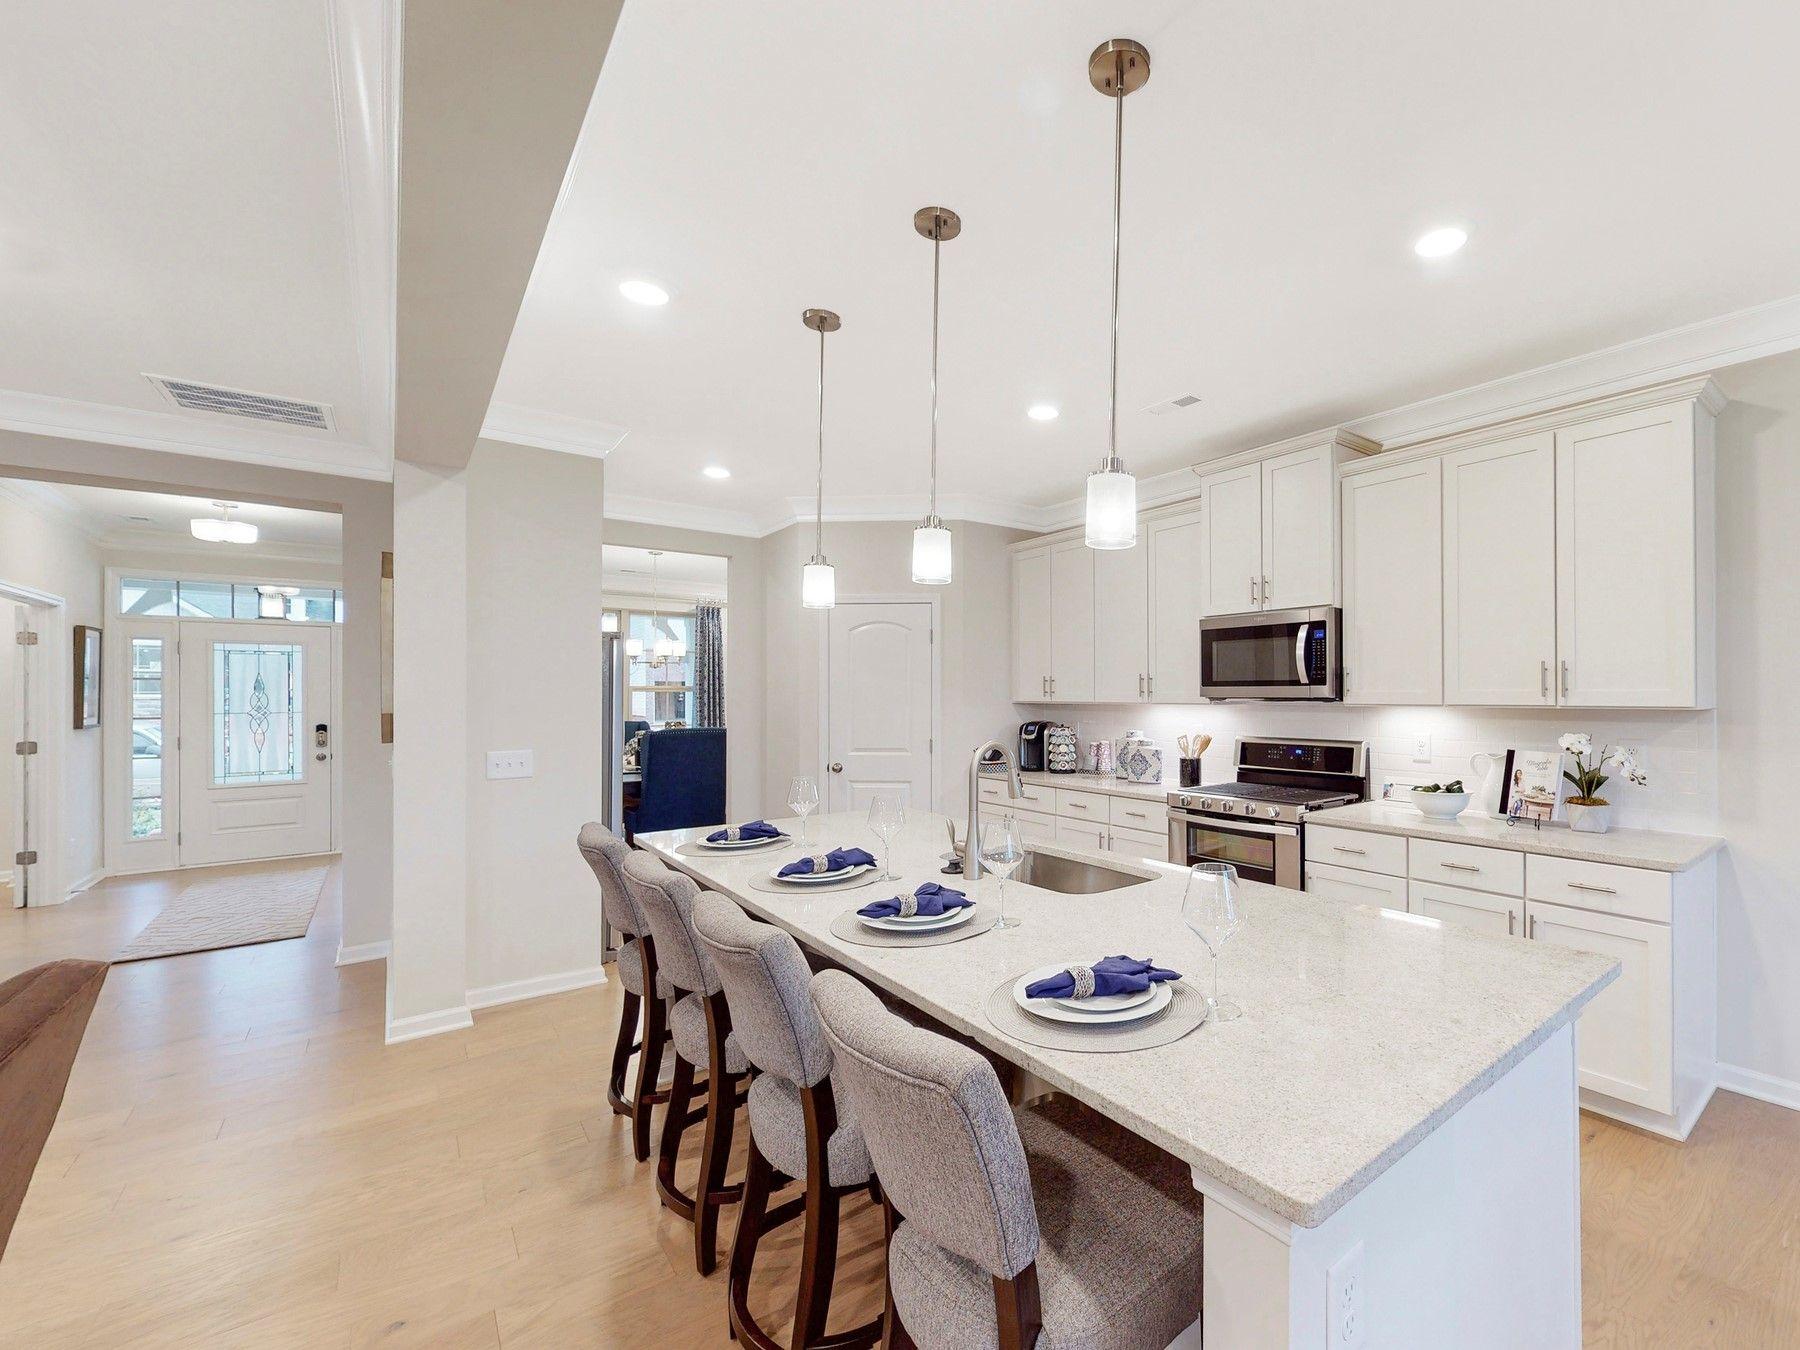 Kitchen featured in the Bridgeport By Century Communities in Charlotte, SC